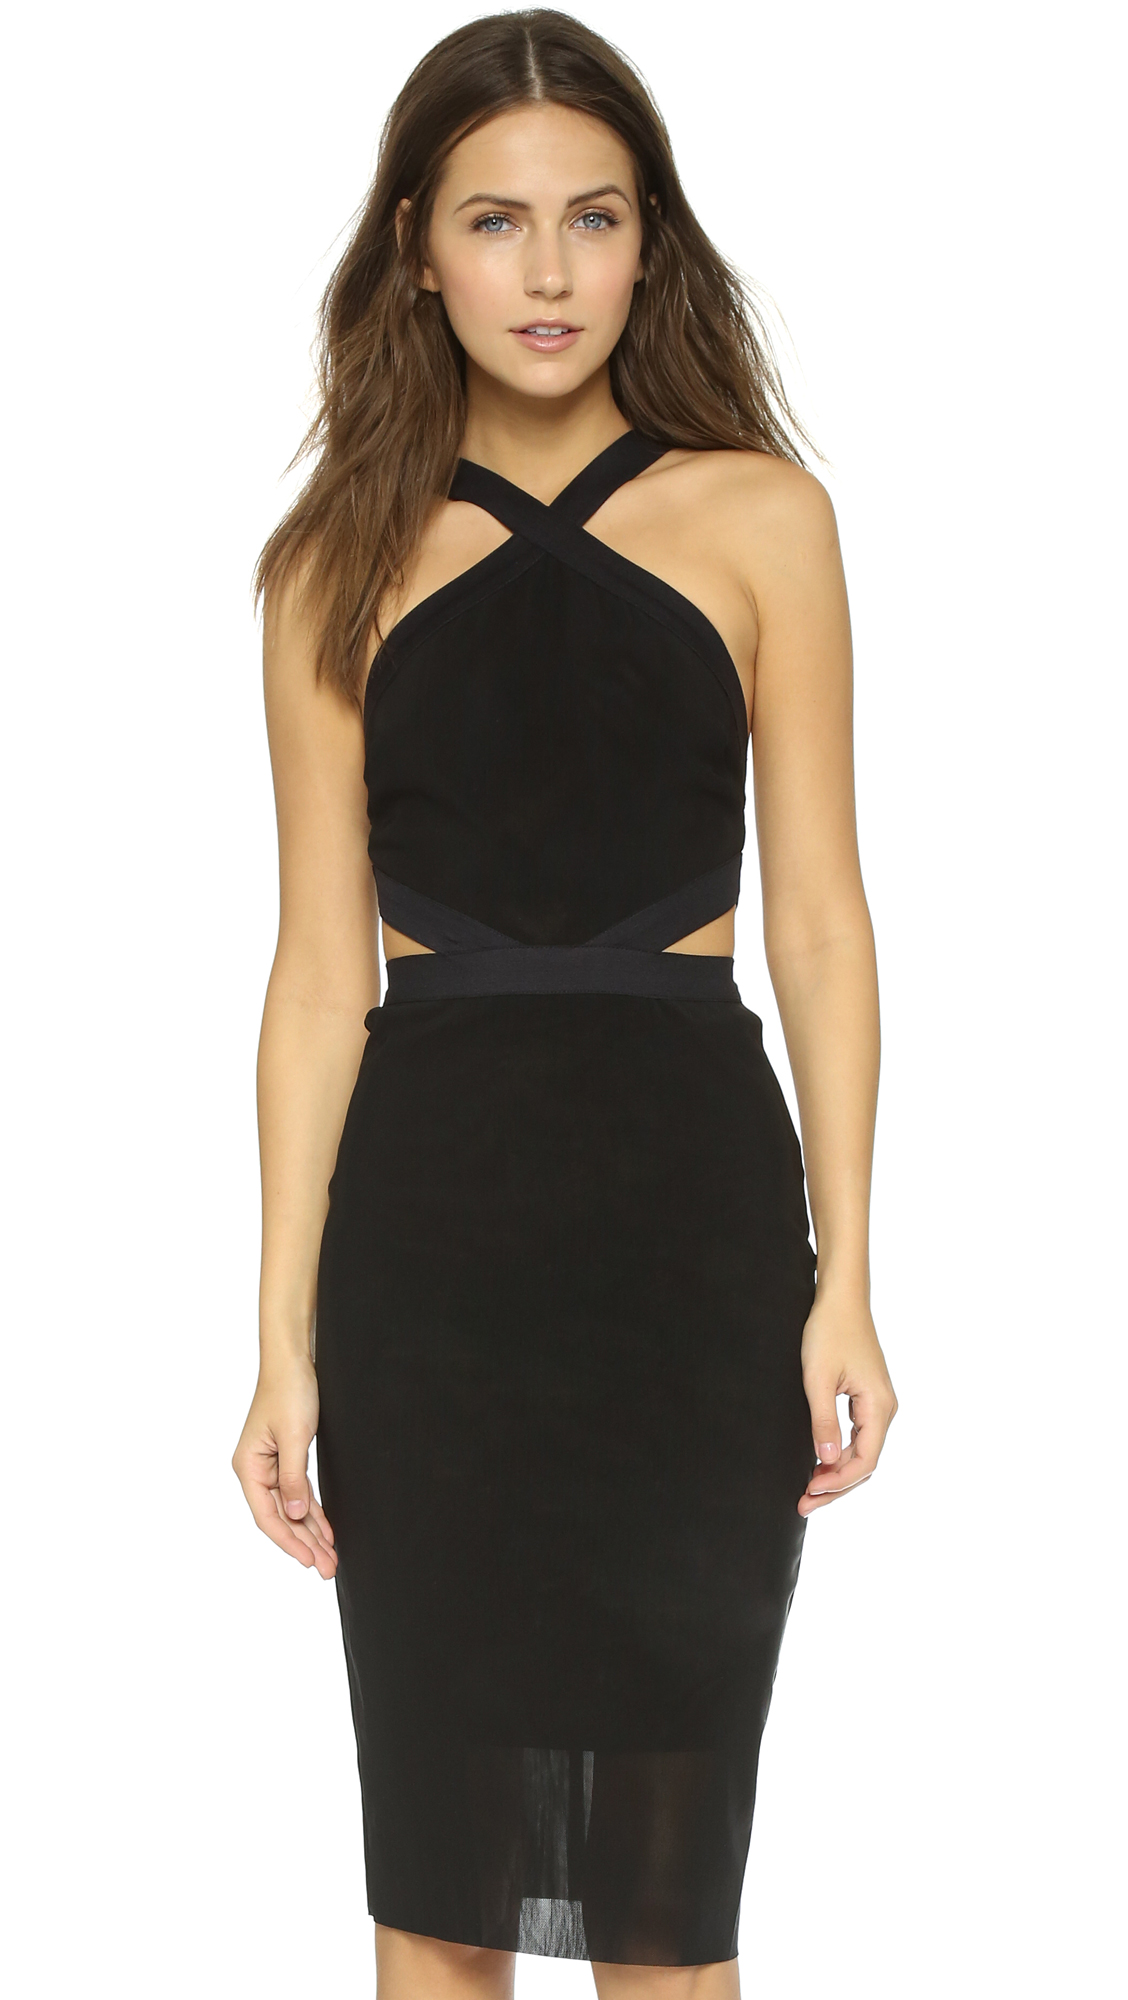 Bec & Bridge Parallel Halter Dress - Black